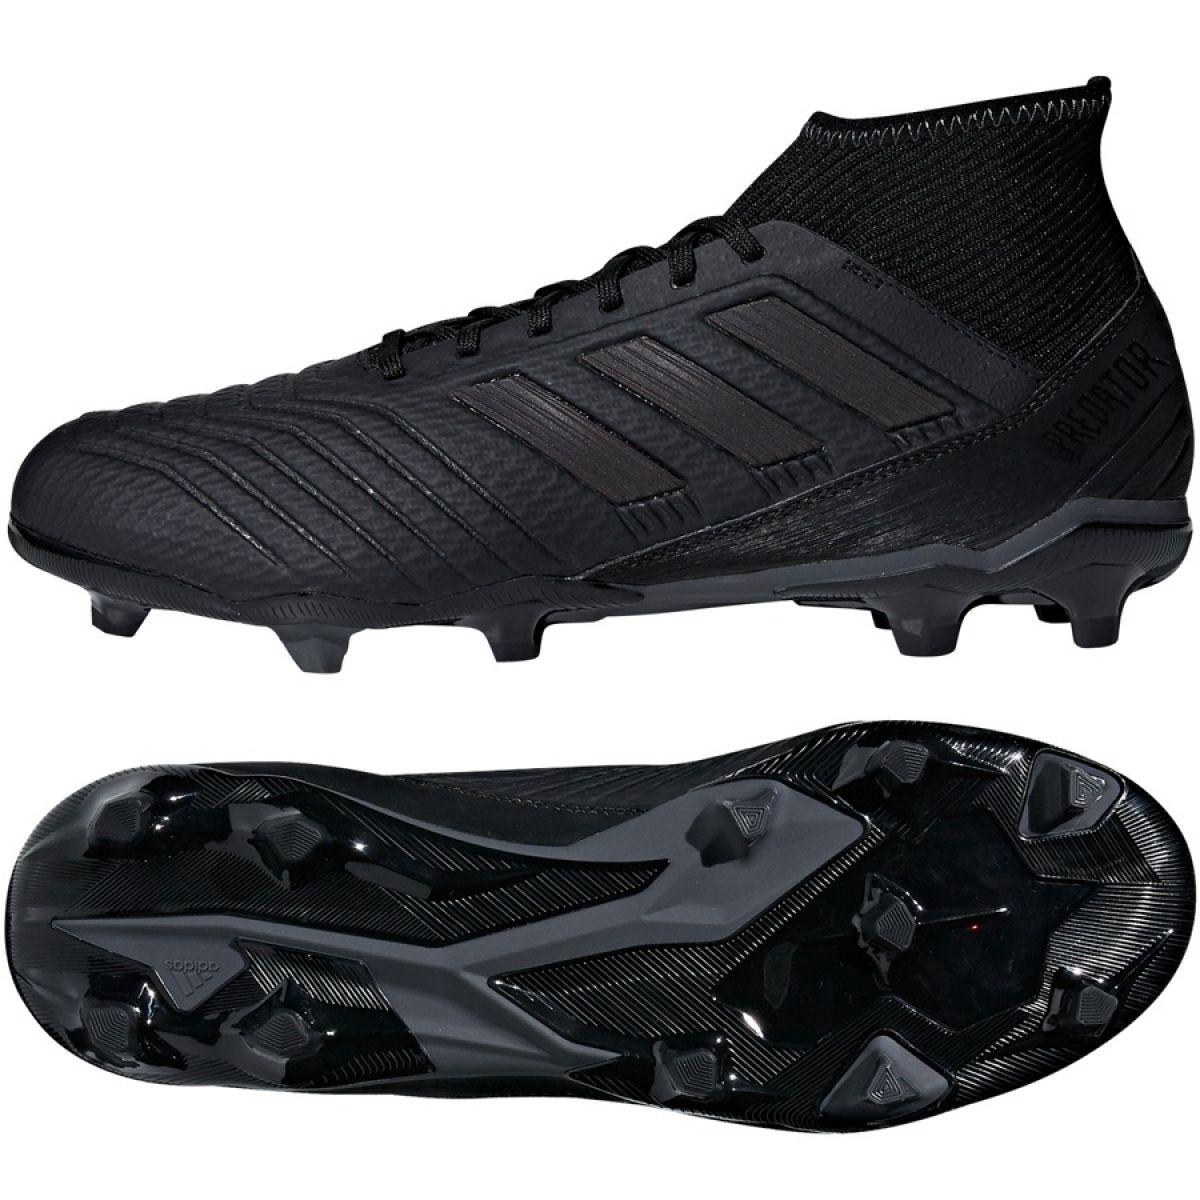 a2ae5dcdd7c5c Buty piłkarskie adidas Predator 18.3 FG M 44 2 3 - 7287299226 - oficjalne  archiwum allegro